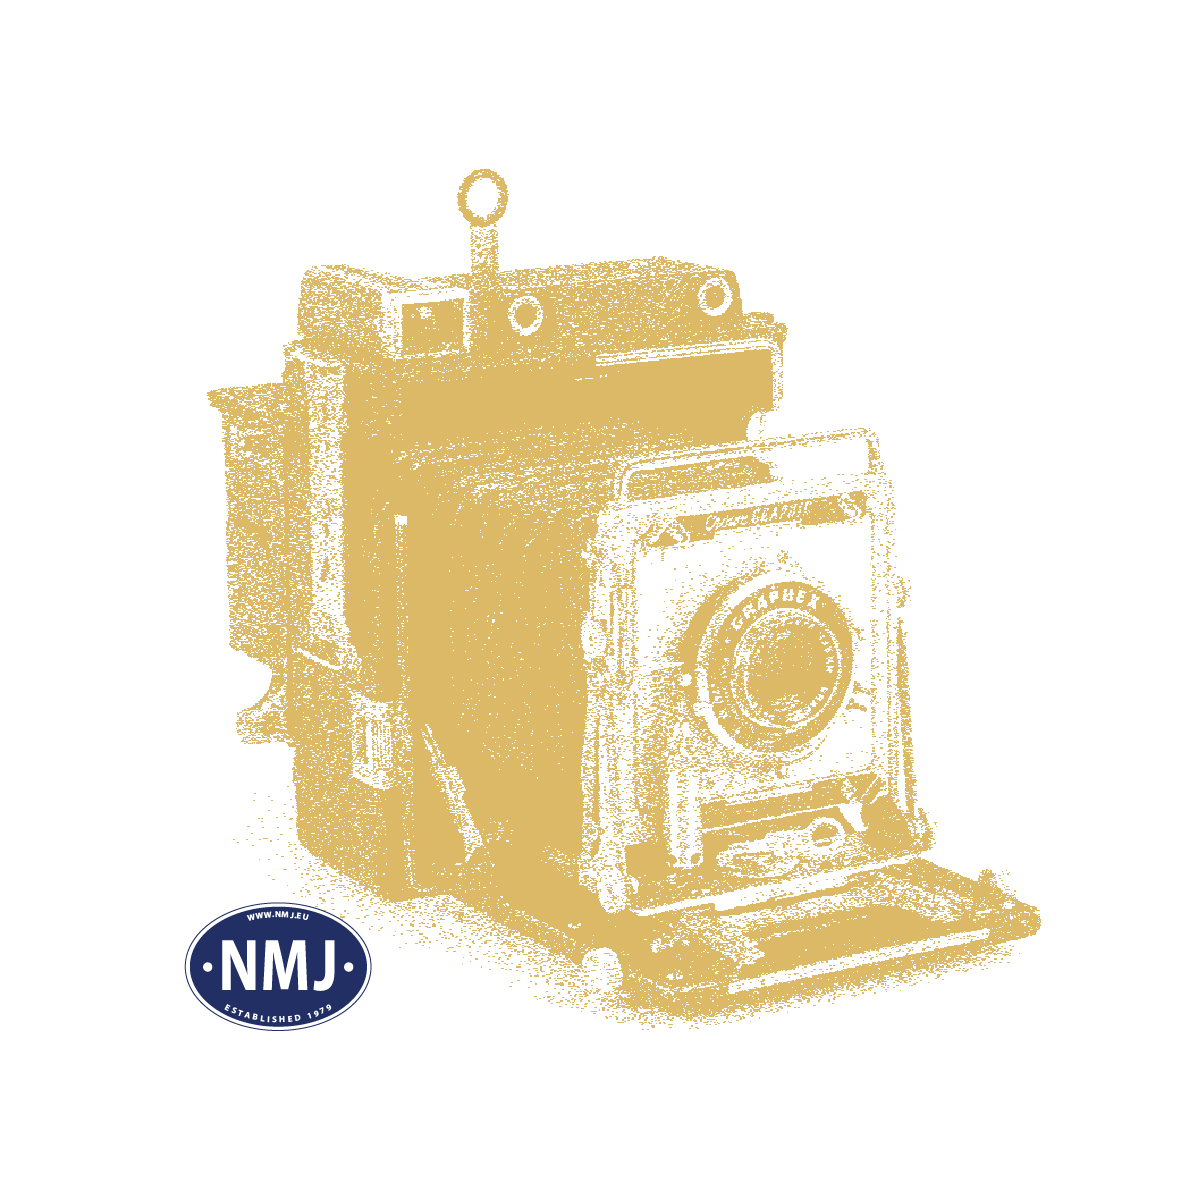 NMJT135.101 - NMJ Topline NSB AB11 24109, 1./2. Klasse Personenwagen Rotbrauner Farbgebung